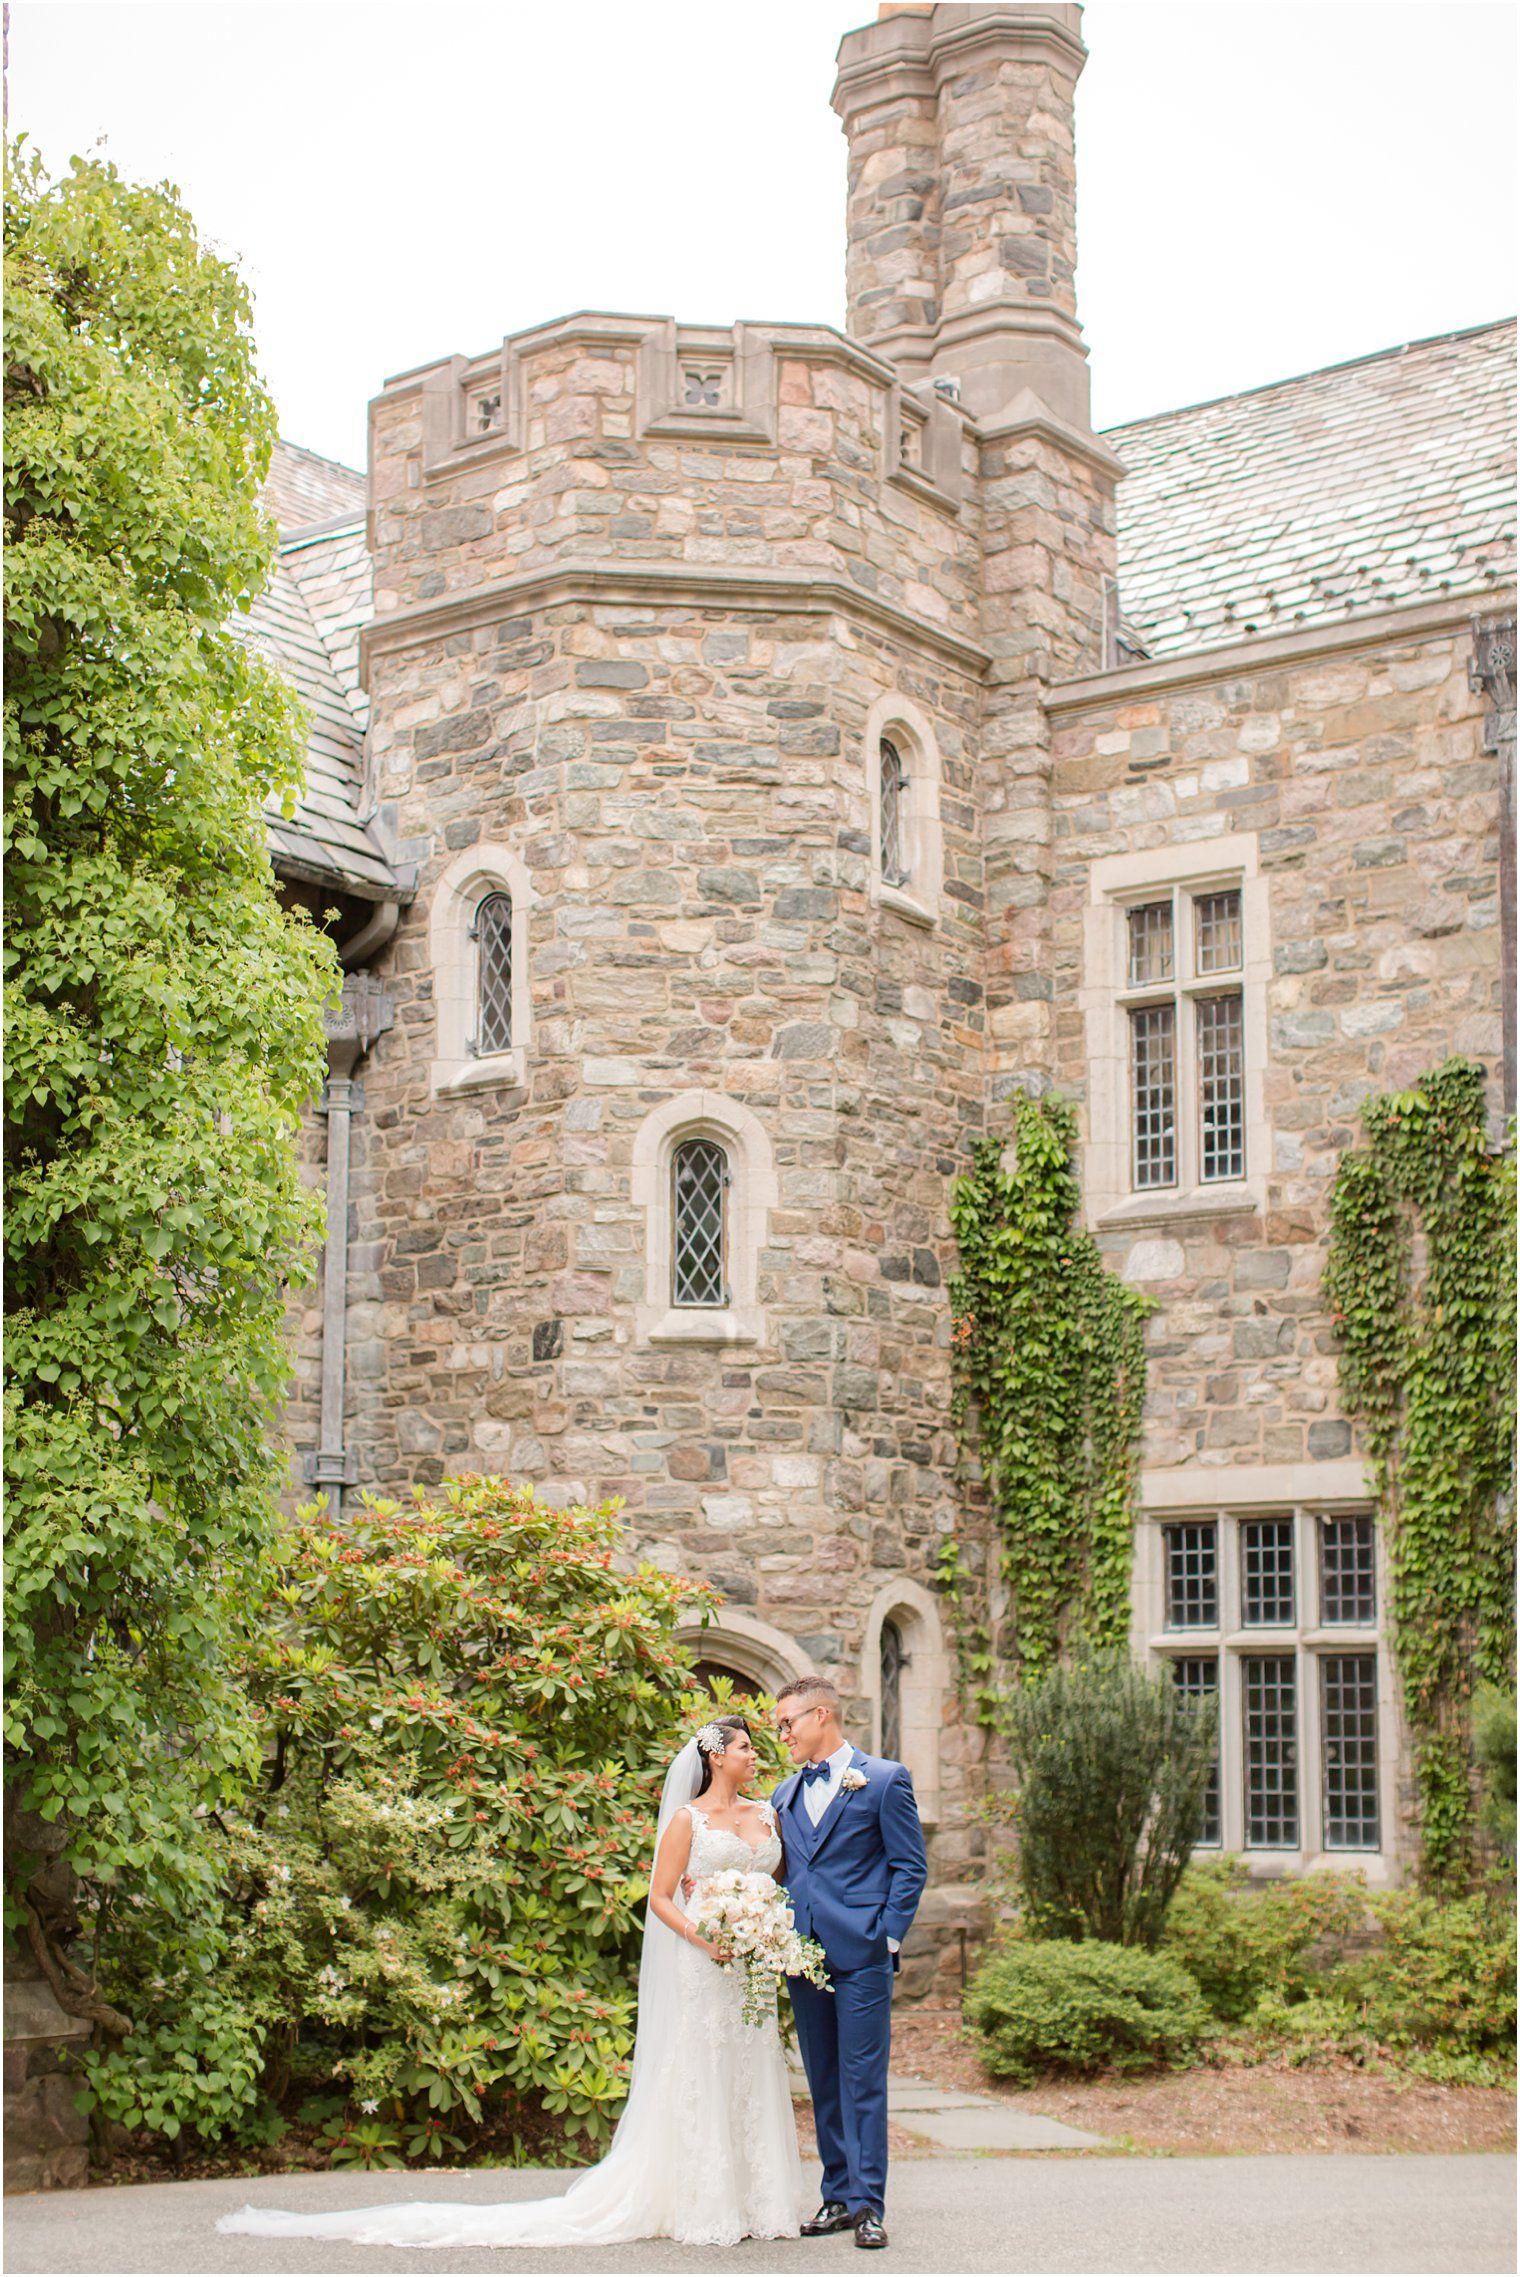 Castle at Skylands Manor Wedding Photos Wedding photos